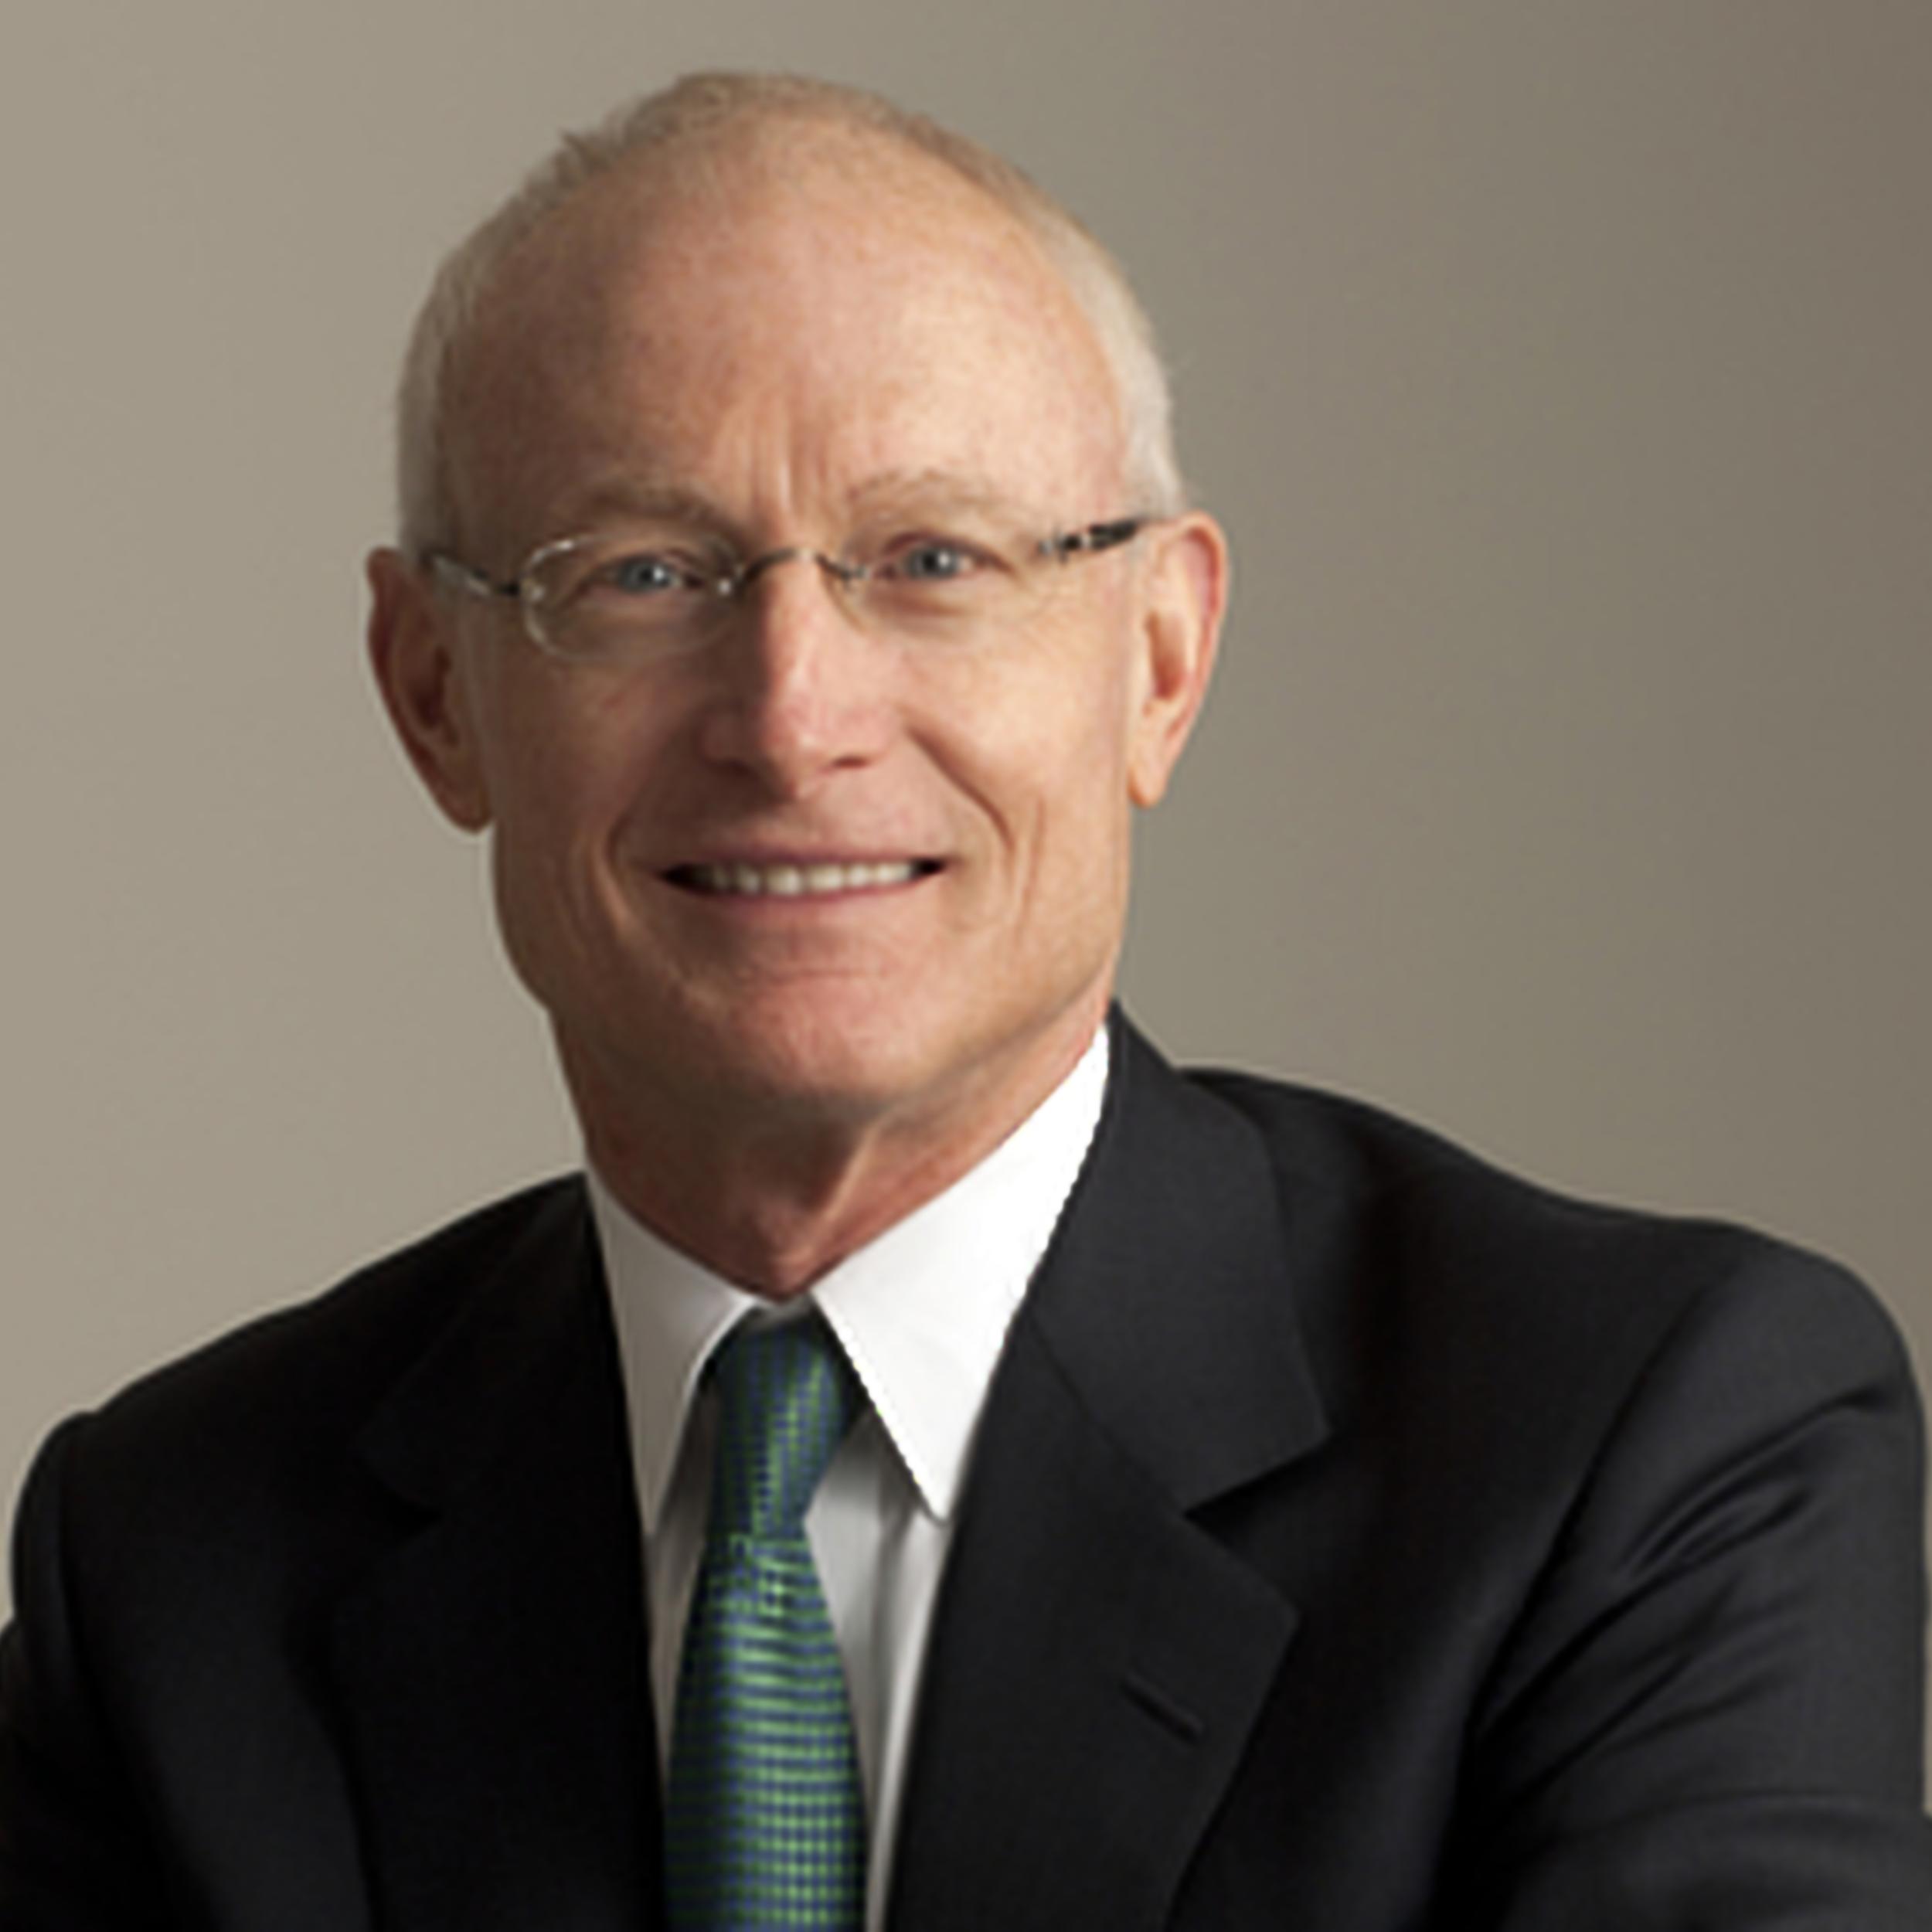 Dr. Michael E. Porter